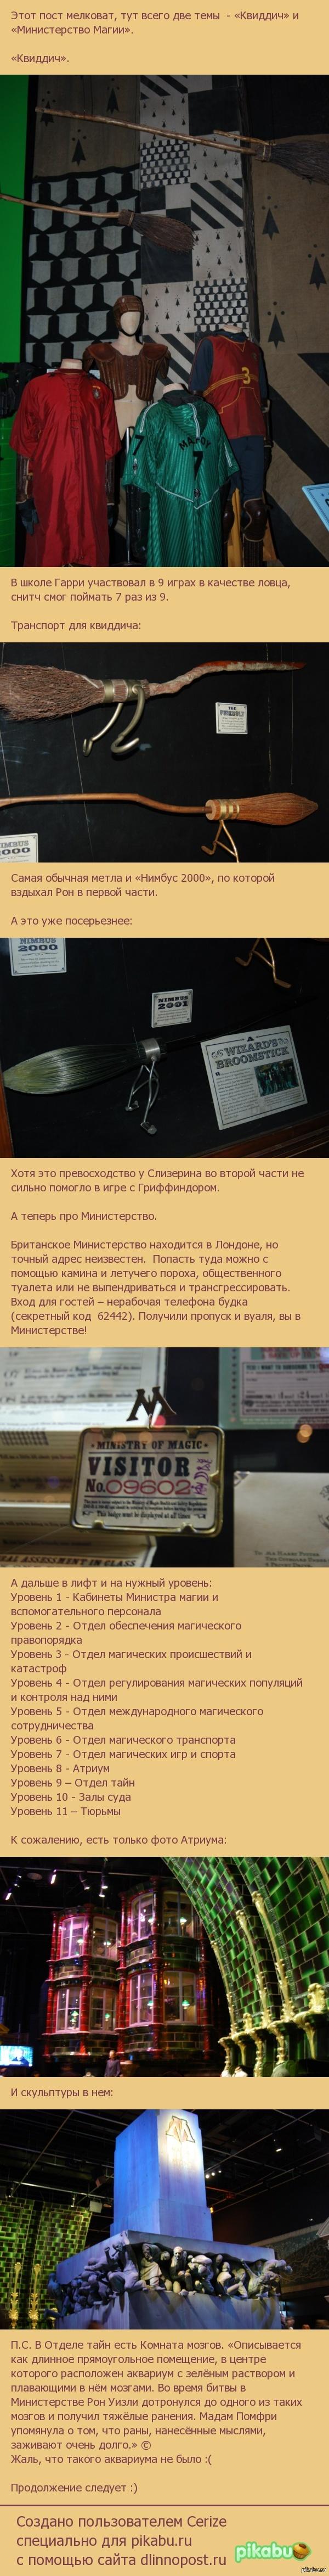 "Студия ""The Making of Harry Potter"", Часть №4 Часть № 3: <a href=""http://pikabu.ru/story/studiya_quotthe_making_of_harry_potterquot_chast_3_2212934"">http://pikabu.ru/story/_2212934</a>"